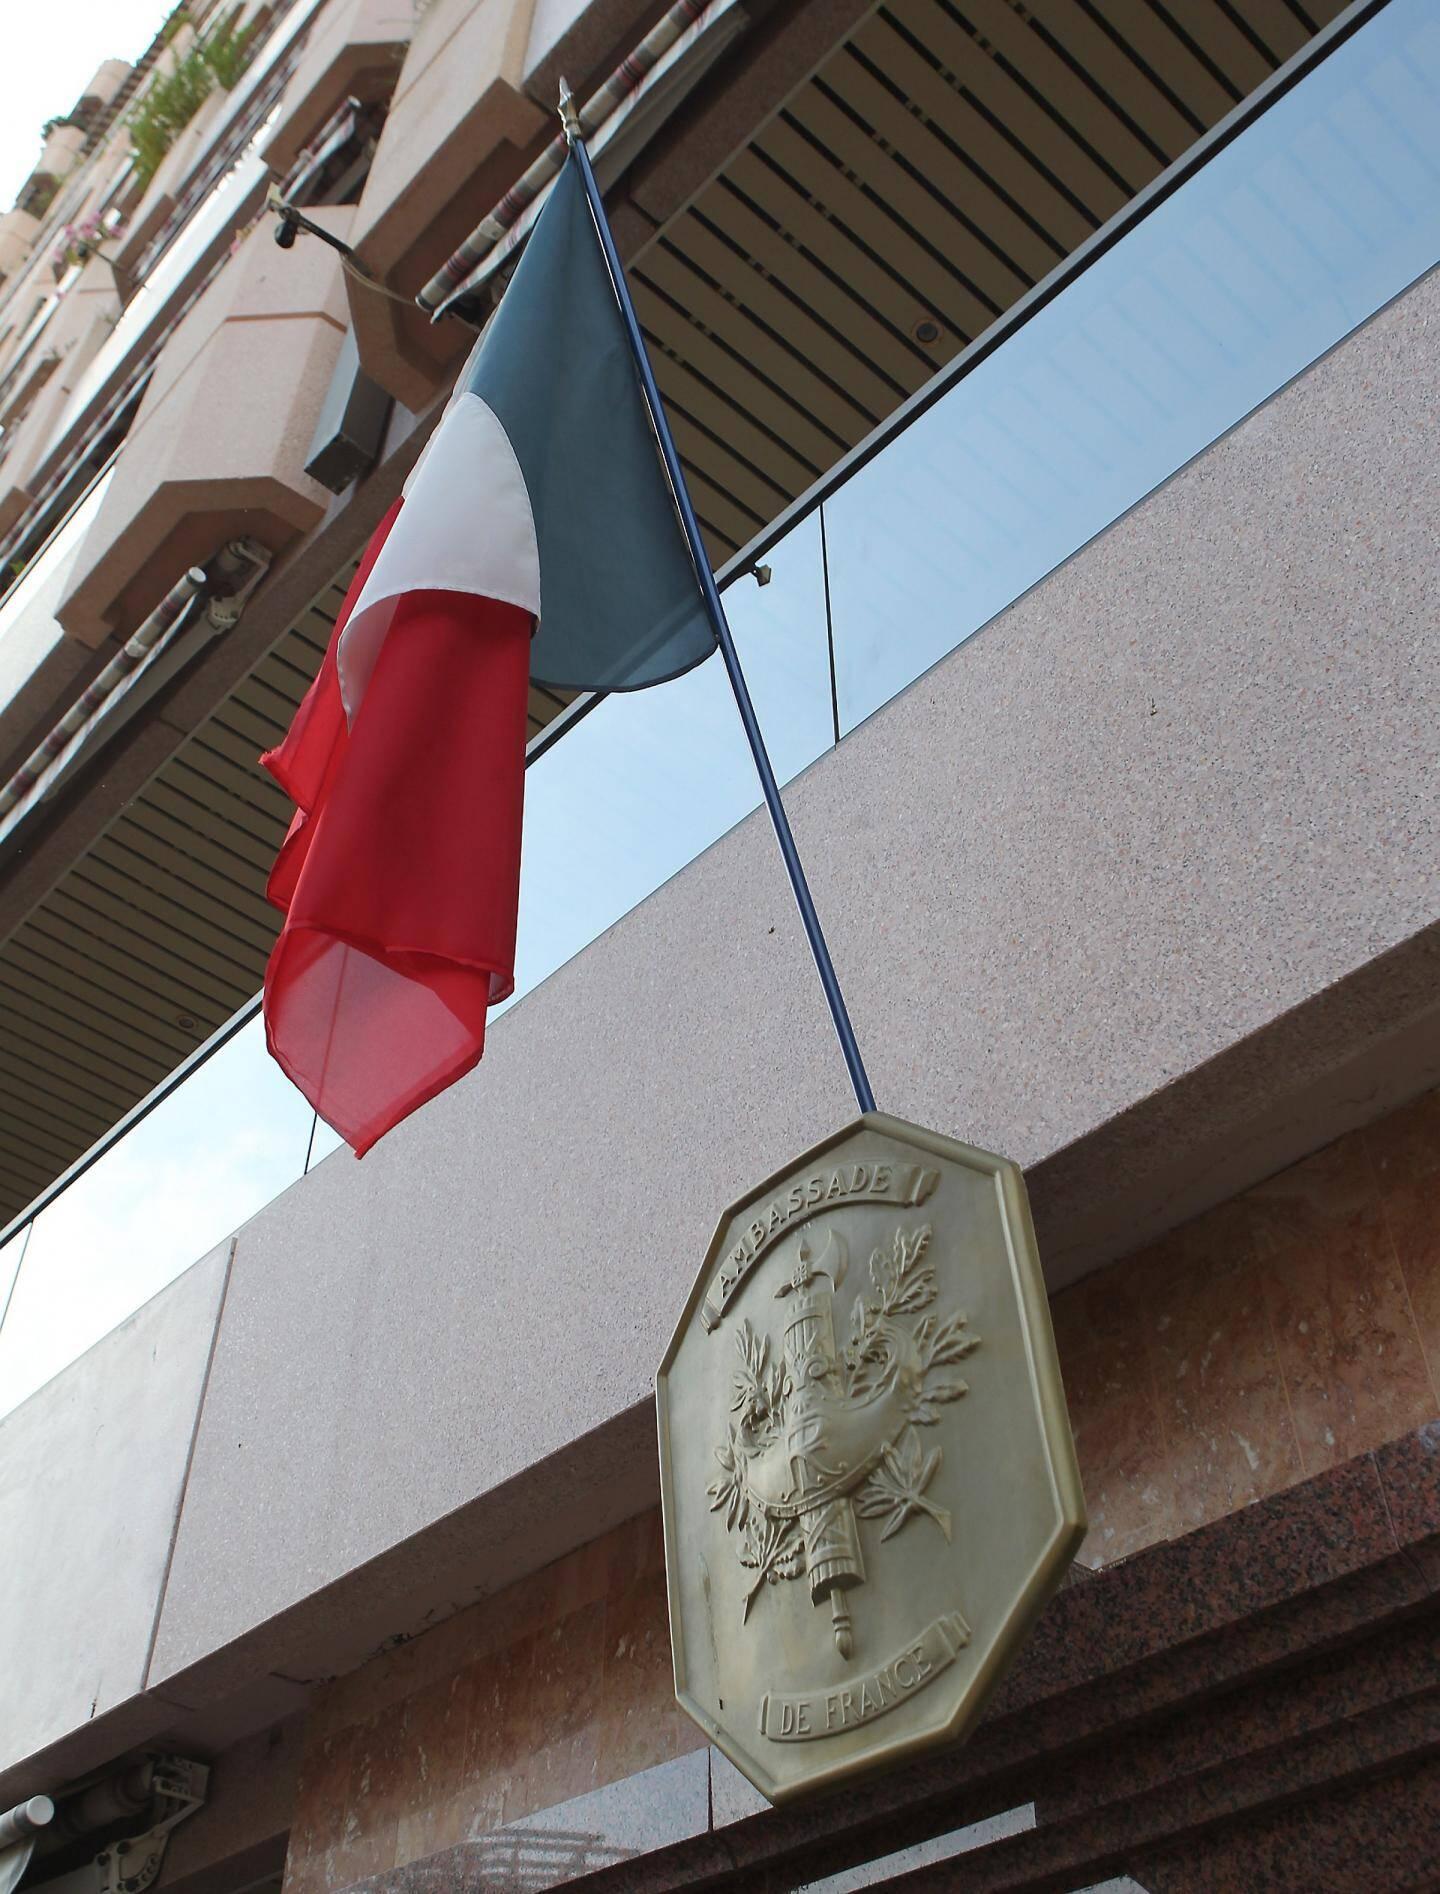 Deux bureaux de vote seront installés à l'ambassade de France, rue du Ténao.